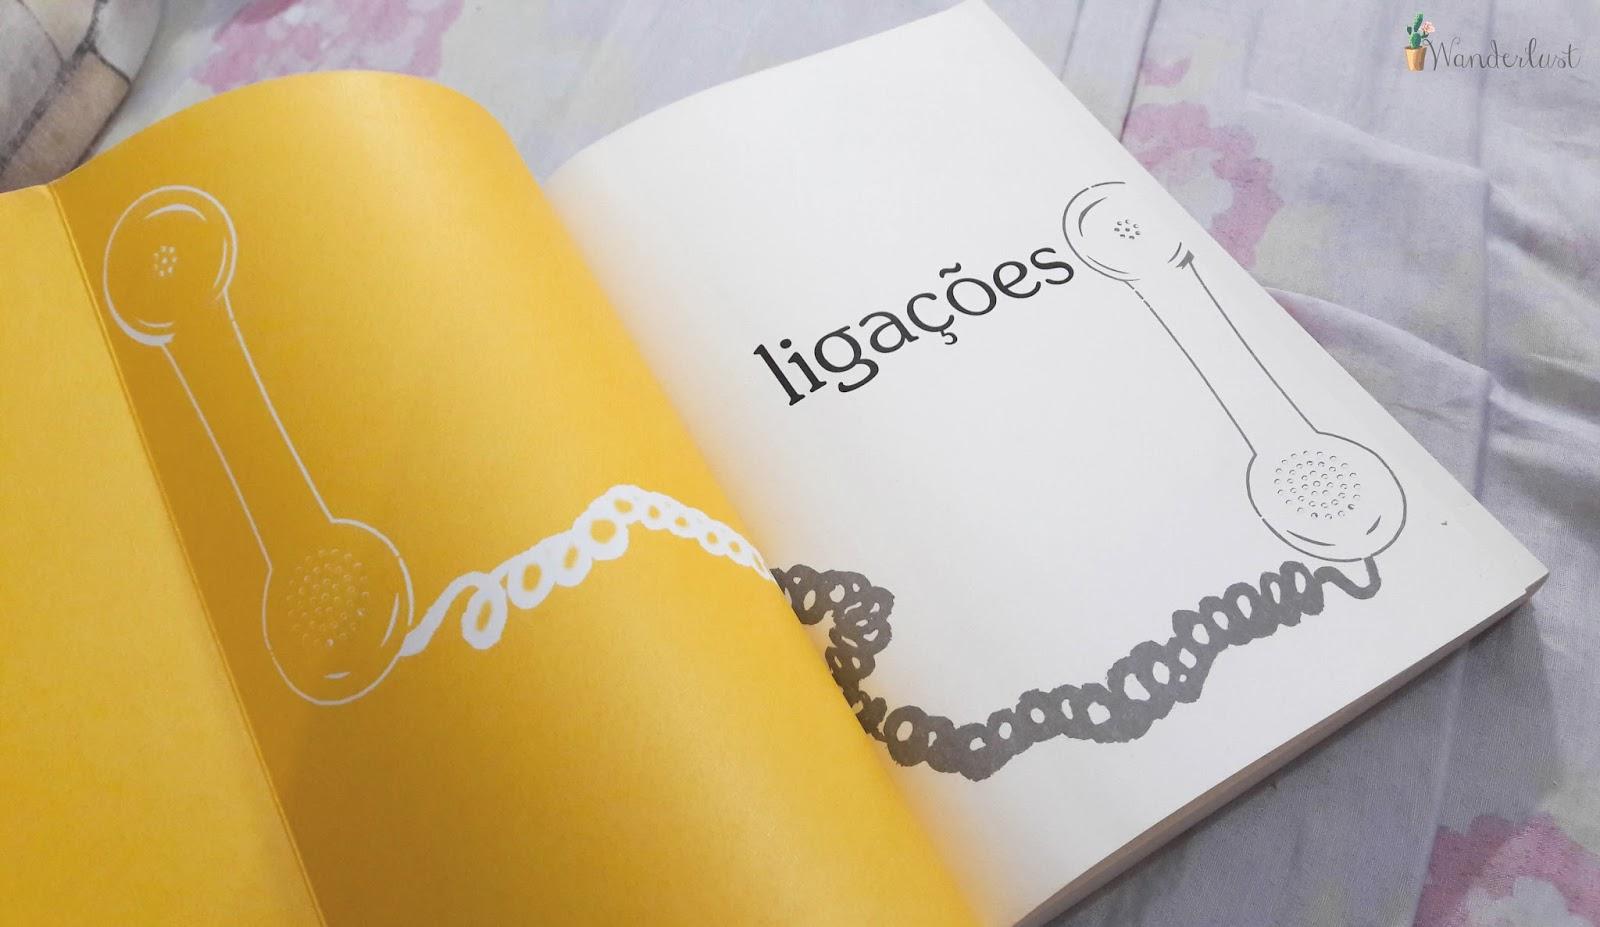 leituras, micaela ramos, livro, fotografia, ligaçoes, rainbow rowell,